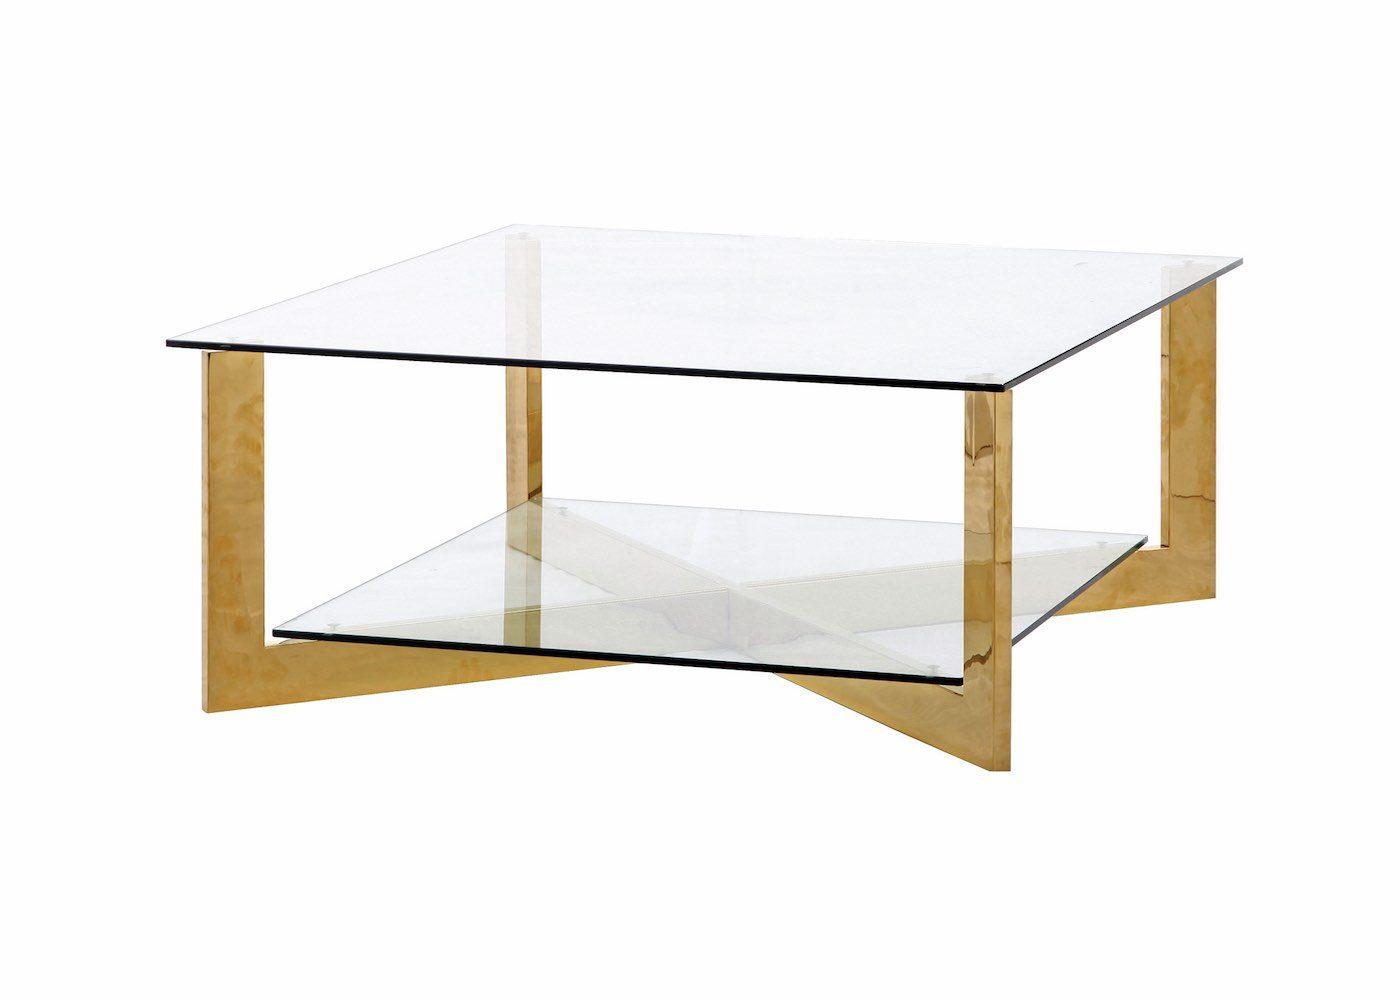 mazarin-ameublement-catalogue-produits-table-basse-2-1